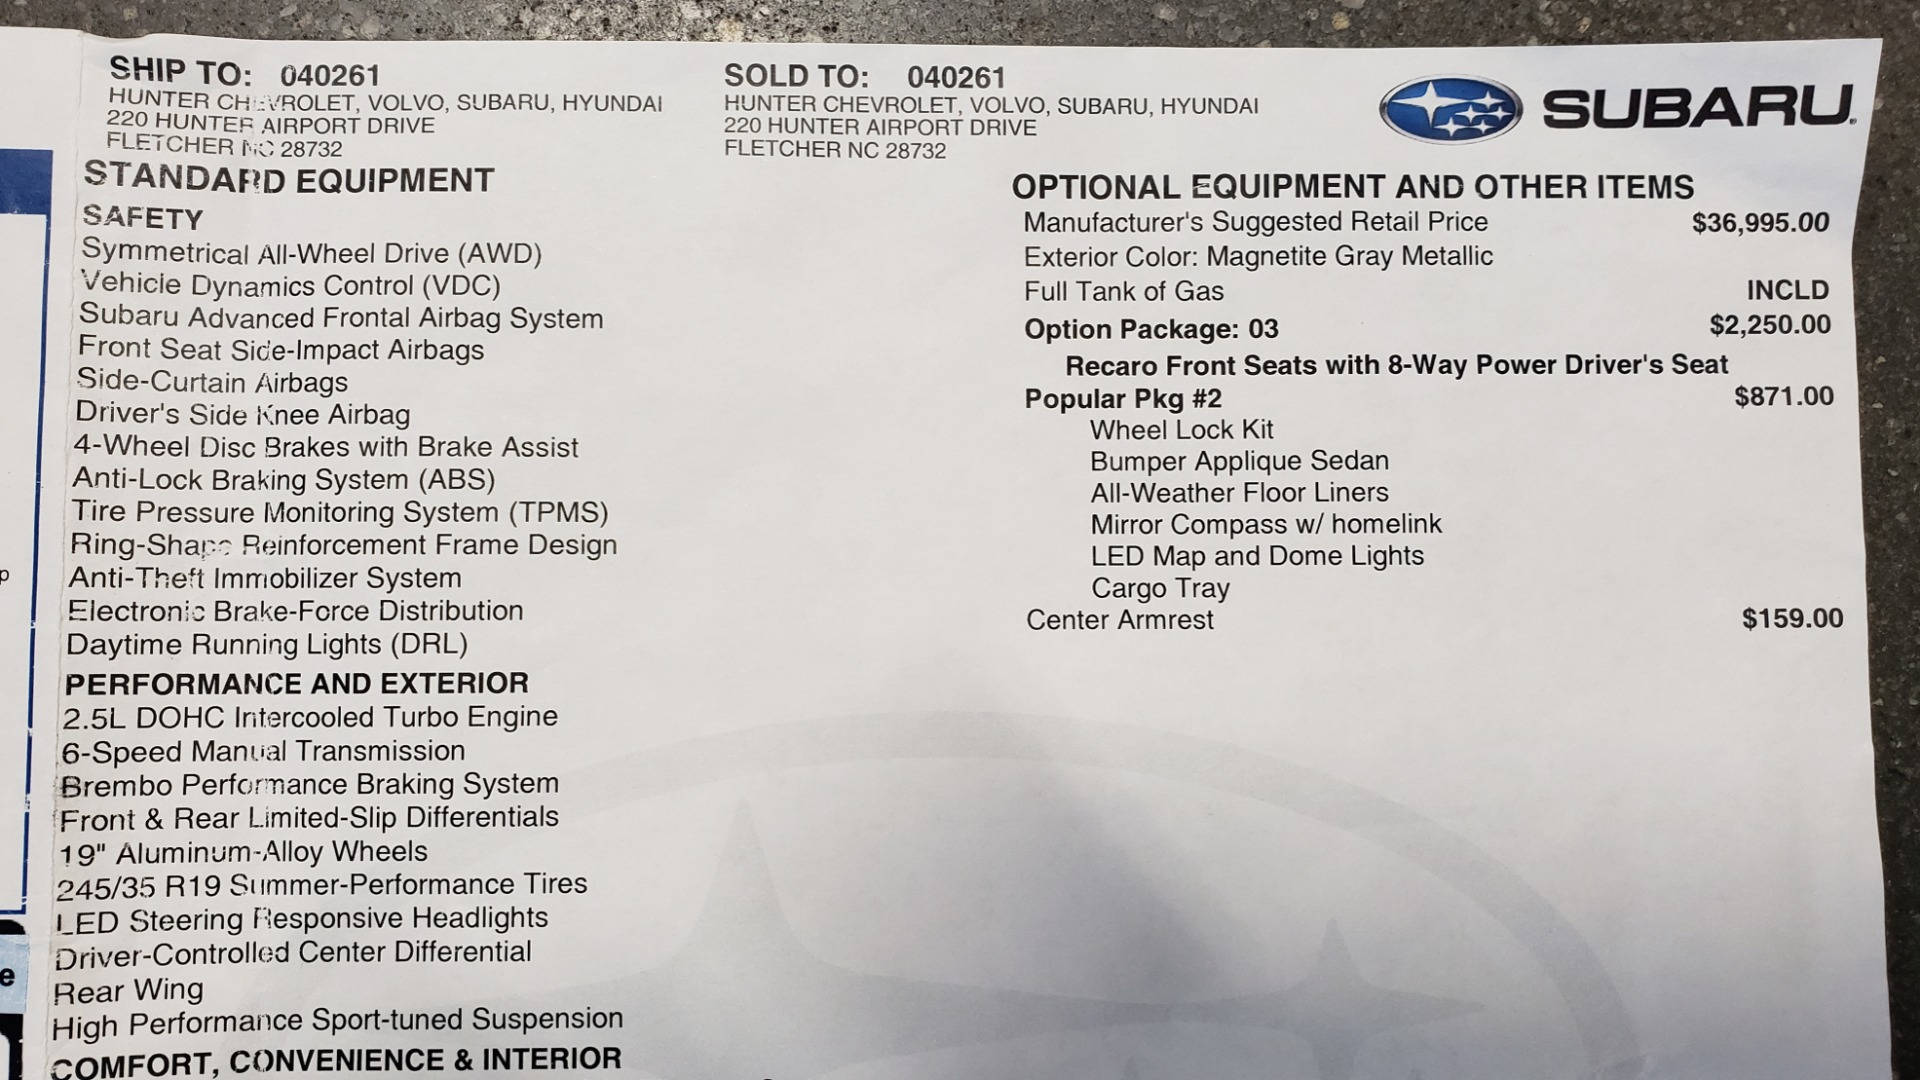 Used 2020 Subaru WRX STI 2.5L TURBO / 6-SPEED MANUAL / RECARO SEATS / REARVIEW for sale Sold at Formula Imports in Charlotte NC 28227 96